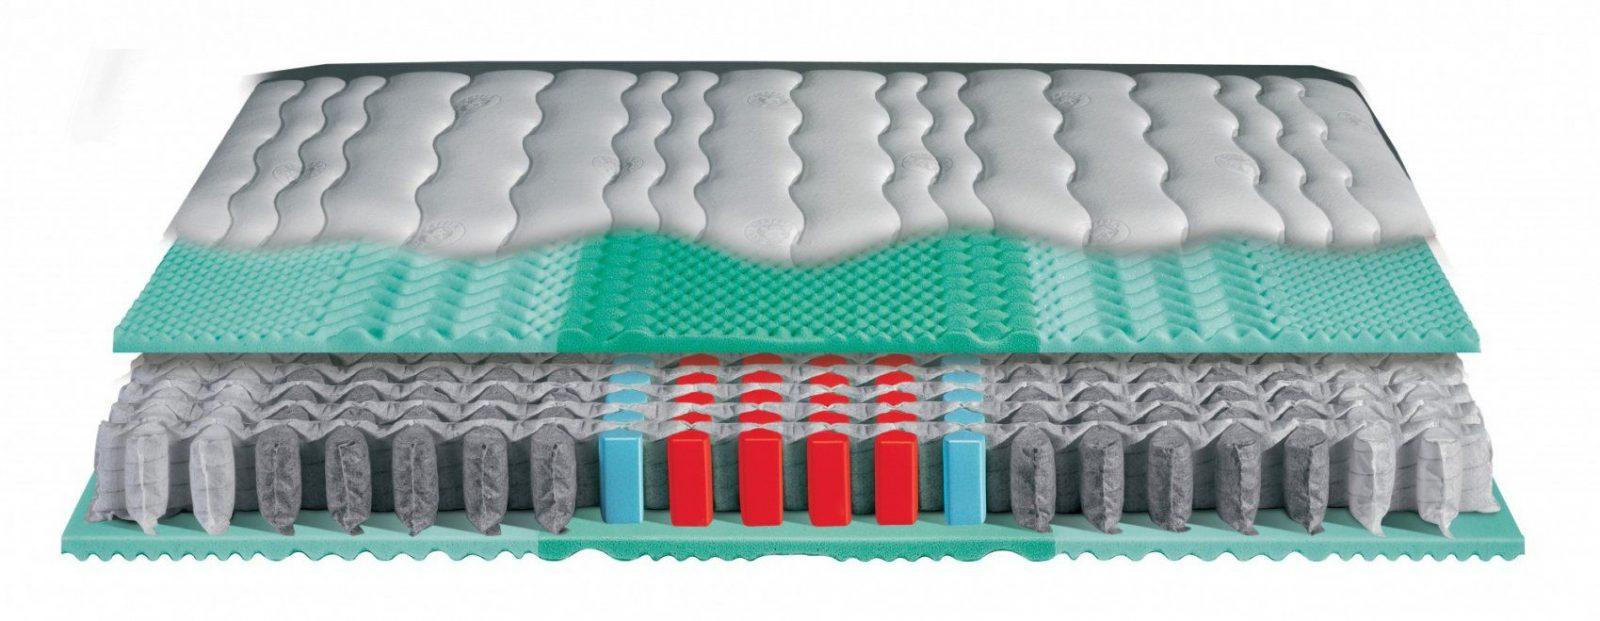 Schlaraffia Viva Plus Aqua Taschenfederkern Plus Matratze von Schlaraffia Viva Plus Aqua H3 90X200 Bild